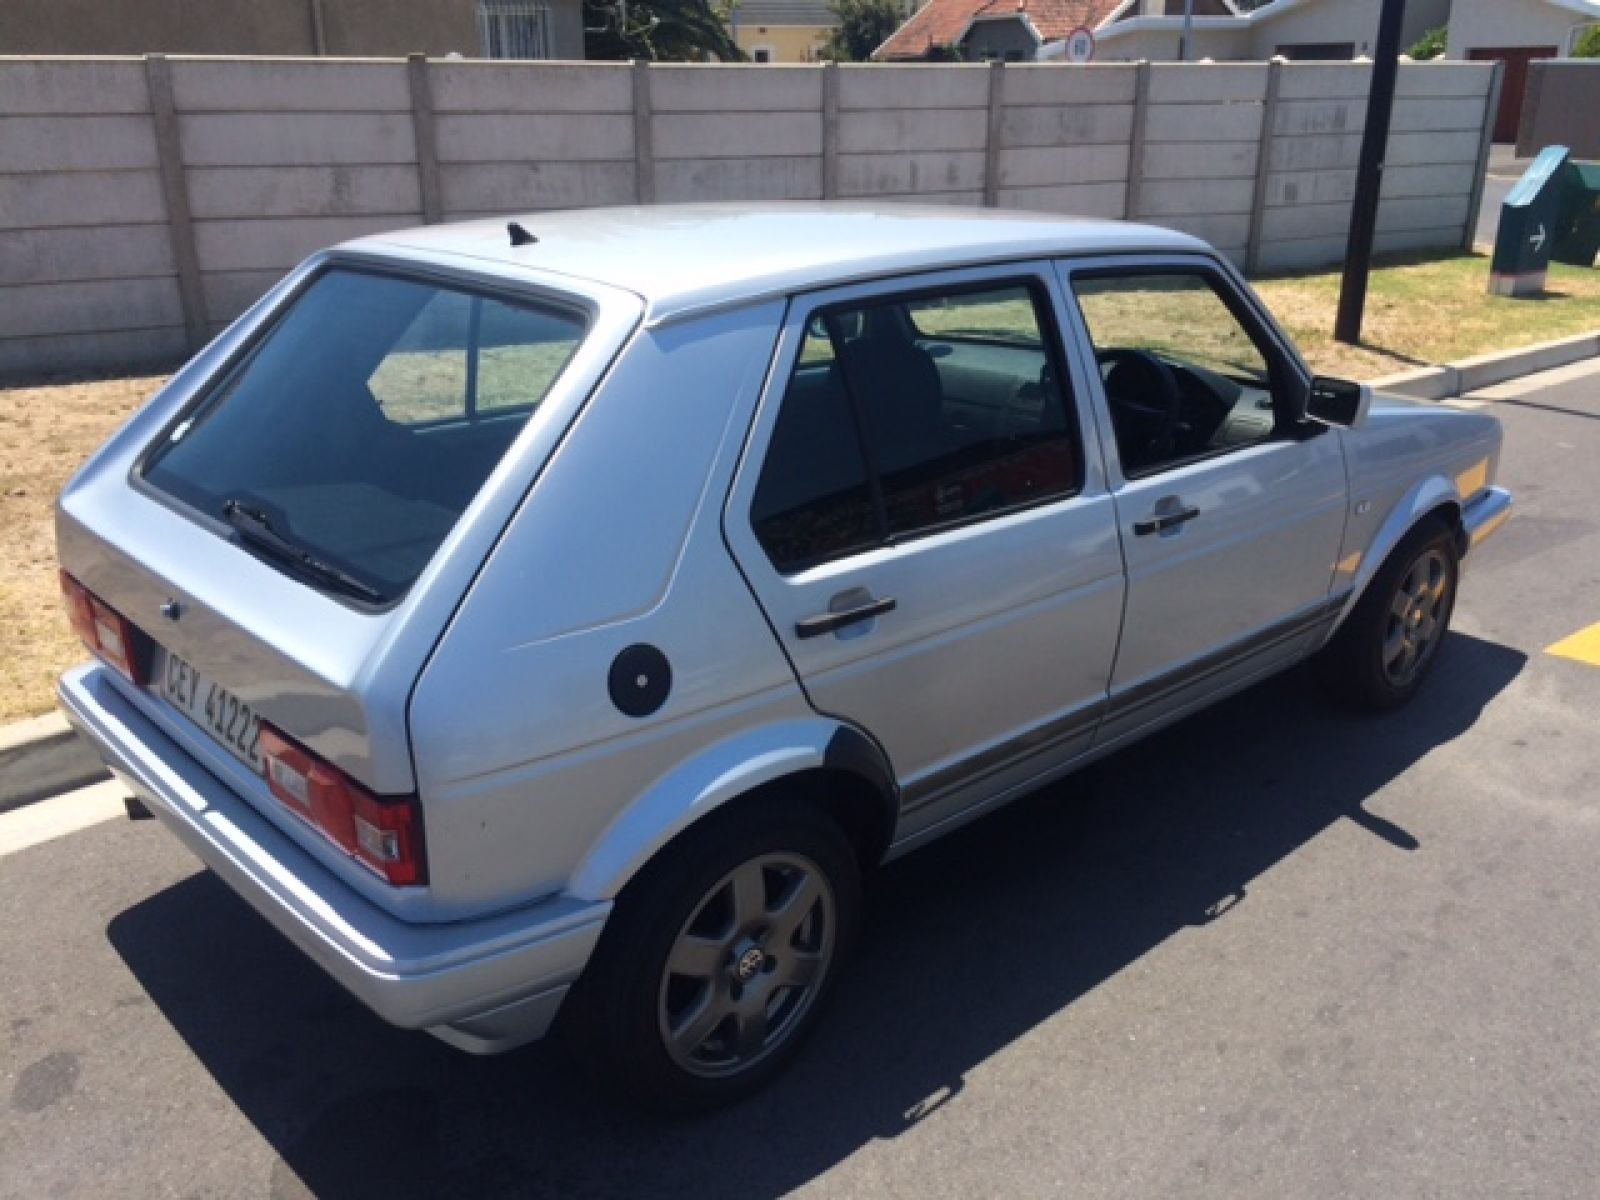 Used Cars For Sale In Vineland Nj Craigslist